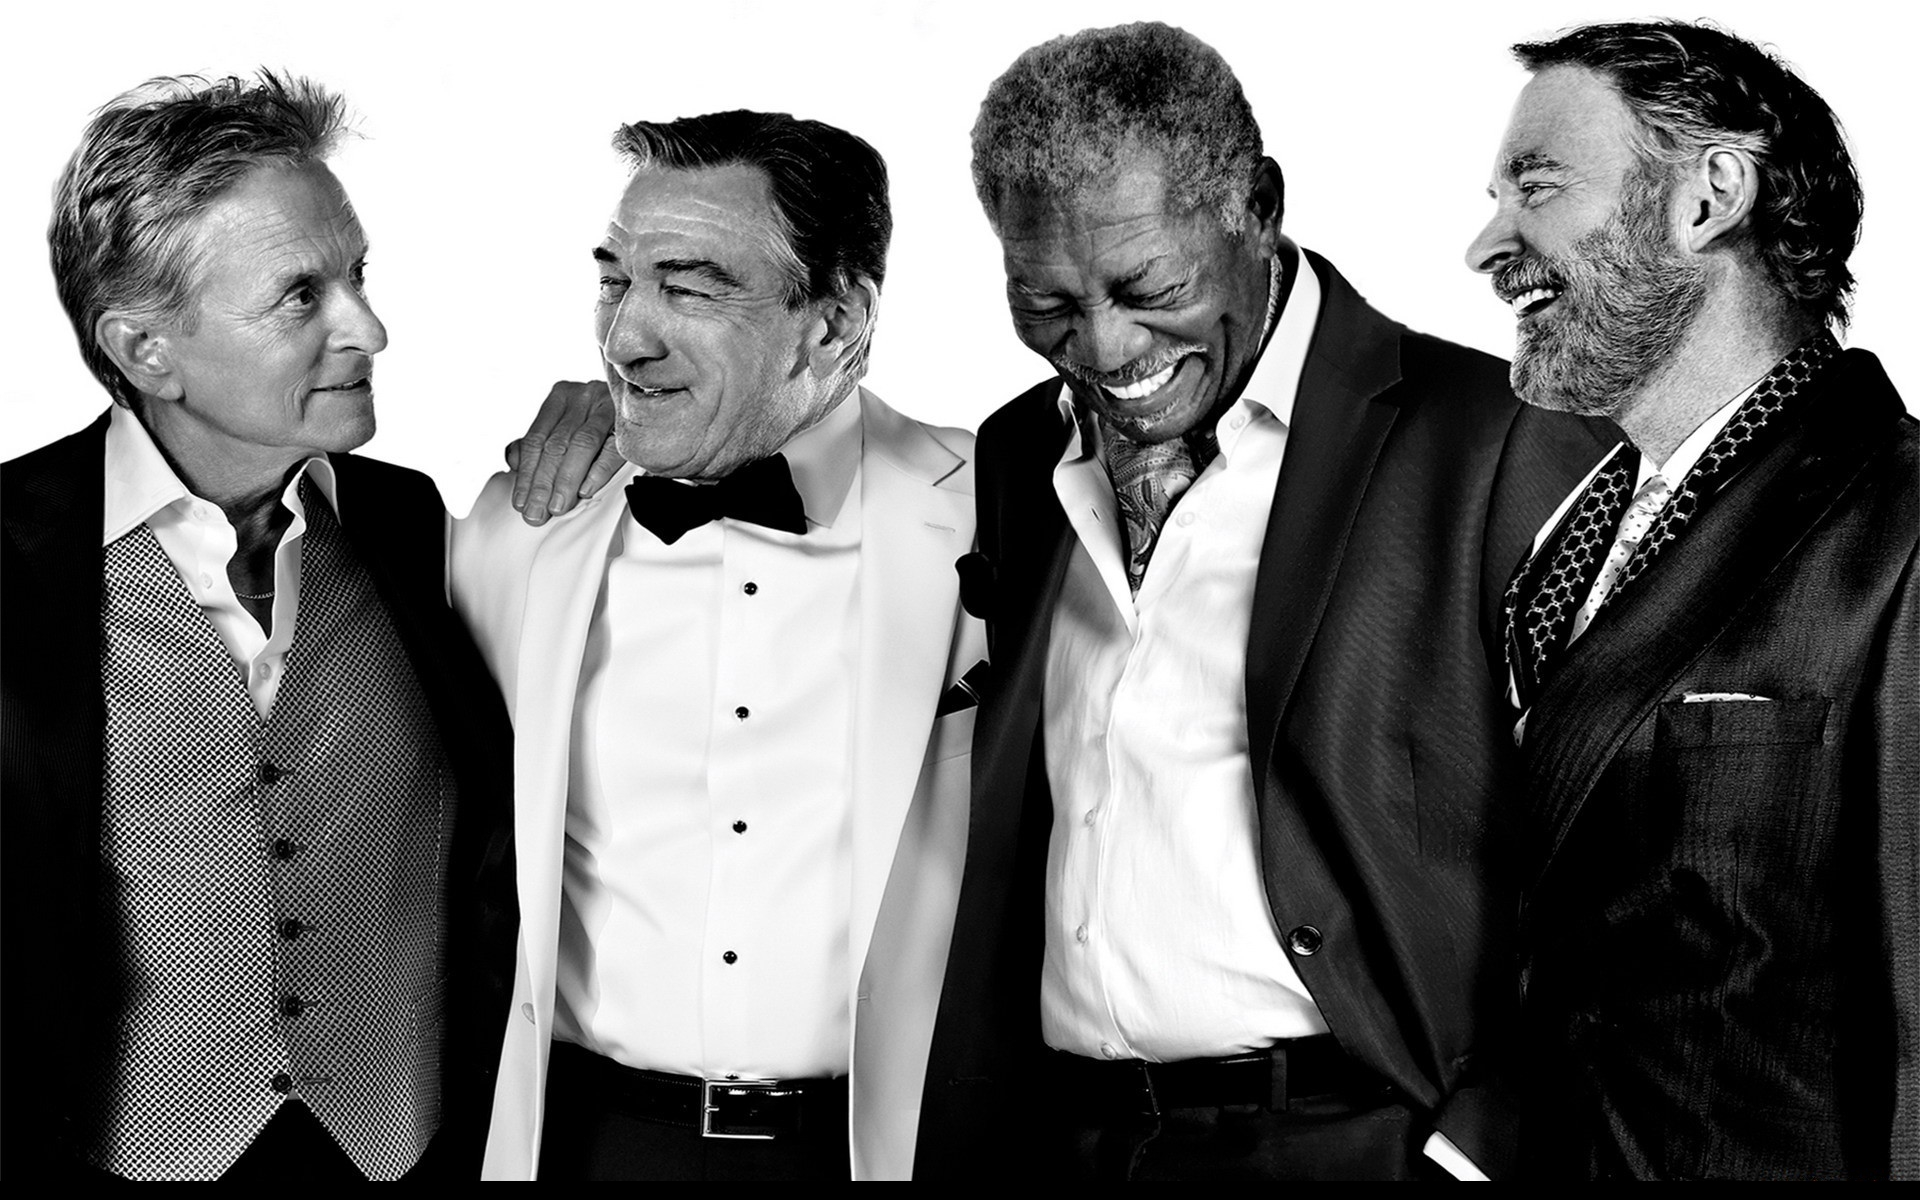 Fonds d'écran Célébrités Homme Robert de Niro